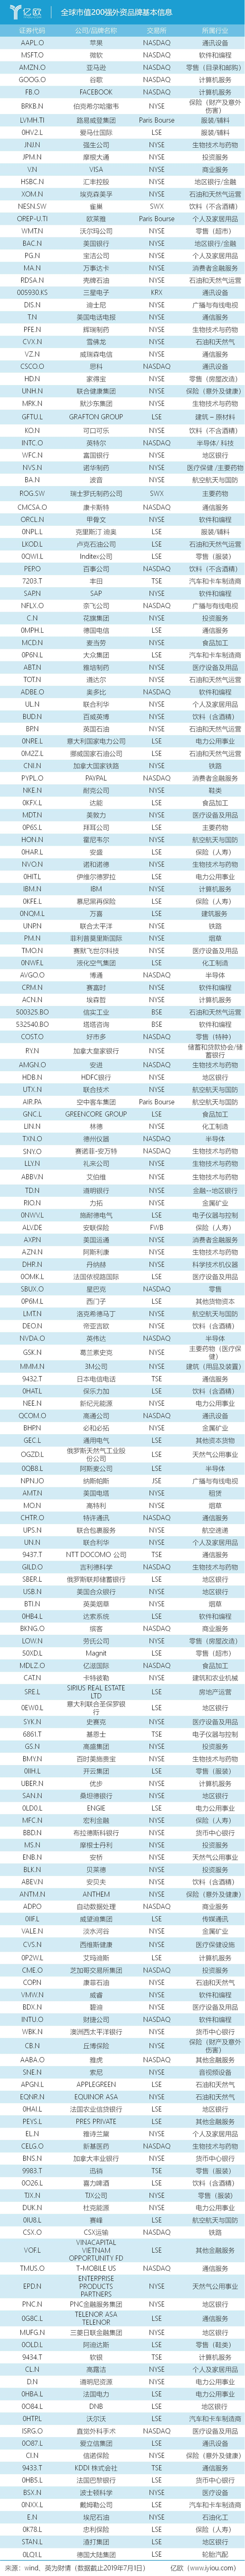 ca88唯一官方网站智库:全球市值200强外资品牌基本信息